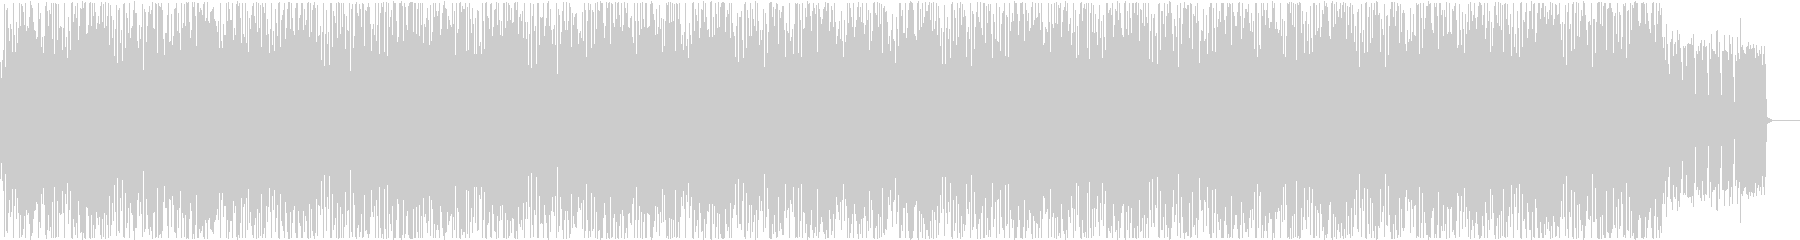 CM、企業VPFuture Bass dの未再生の波形